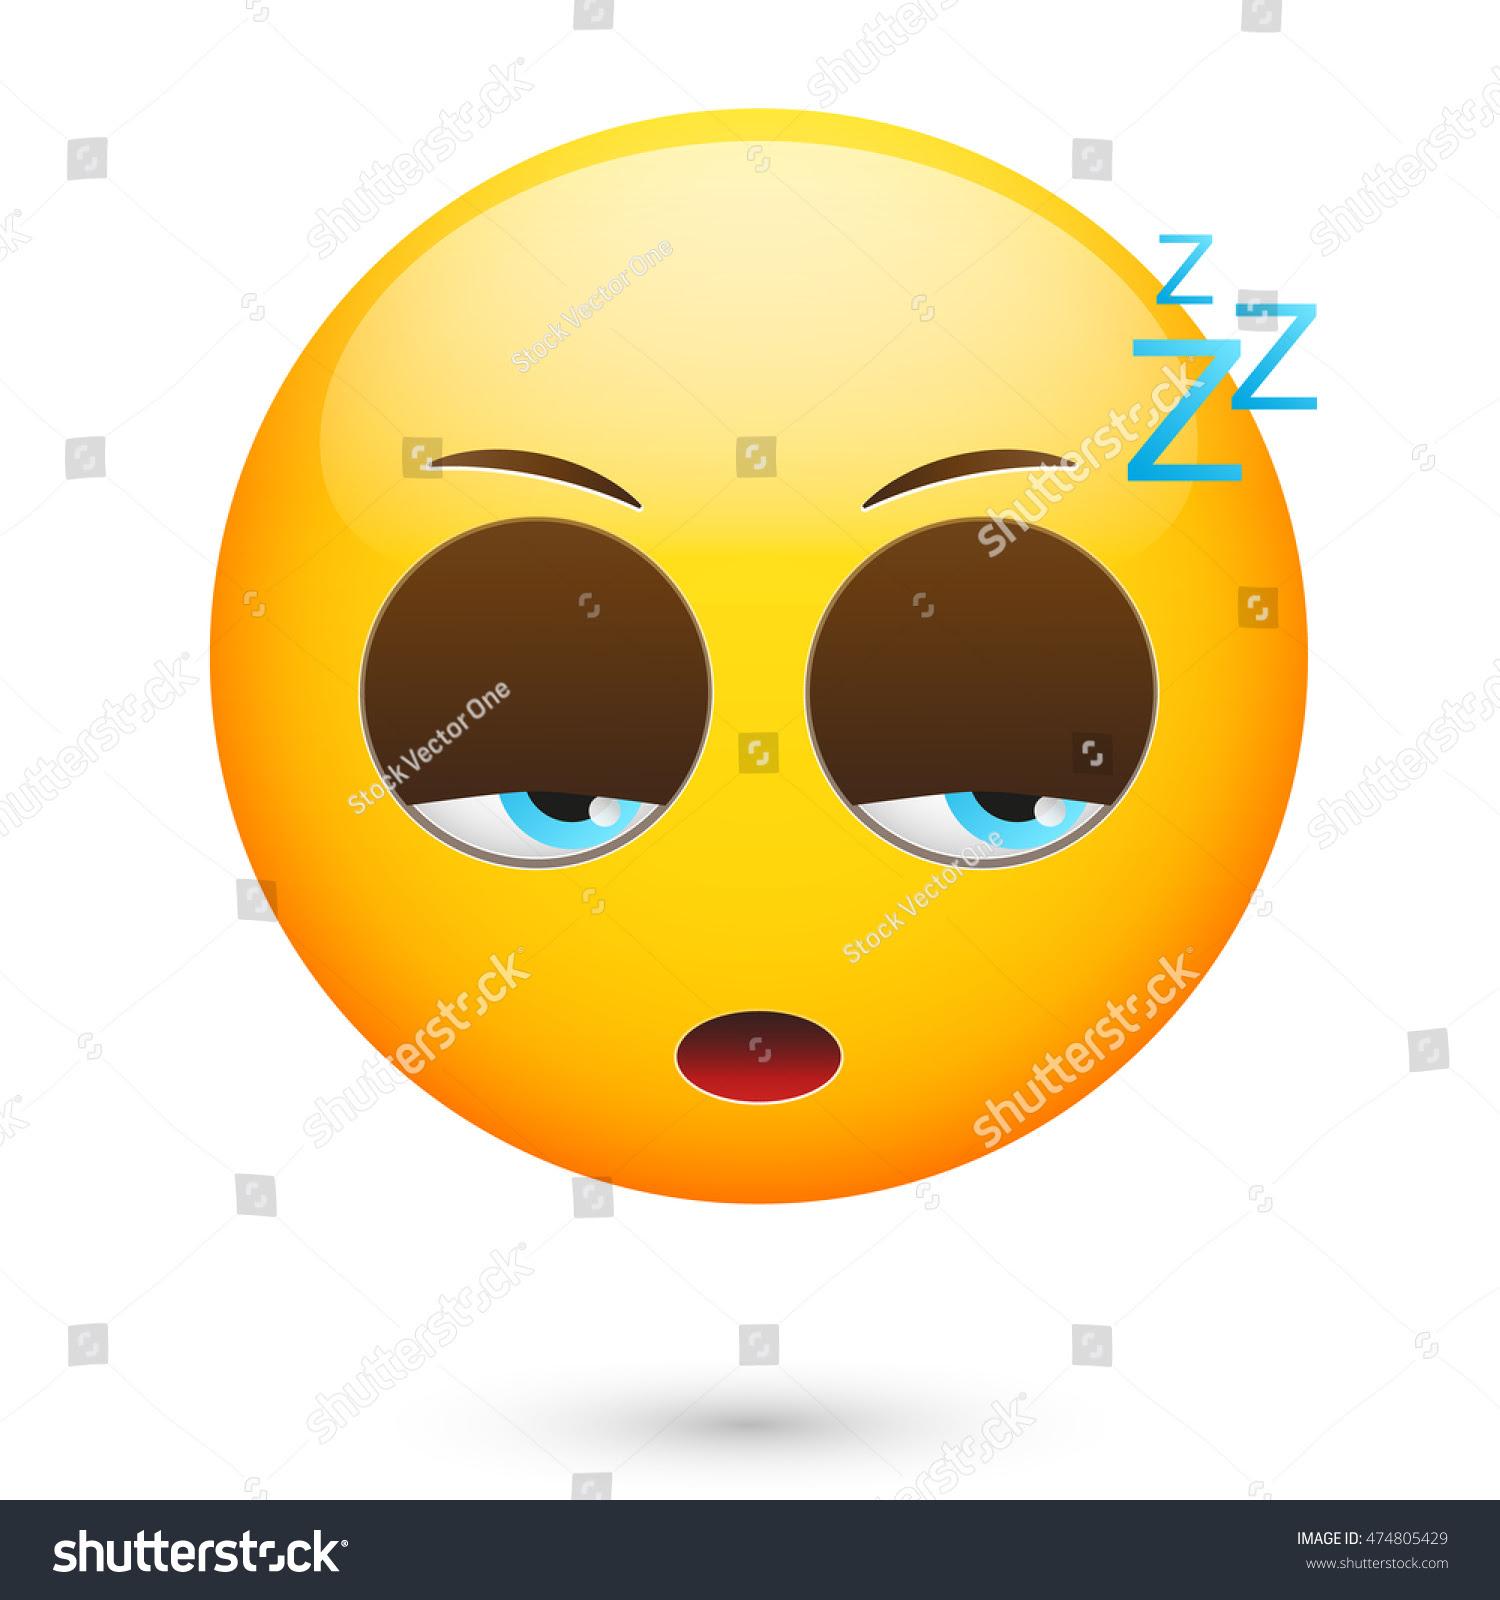 Unduh 80+ Gambar Emoticon Tidur Bergerak Paling Bagus Gratis HD